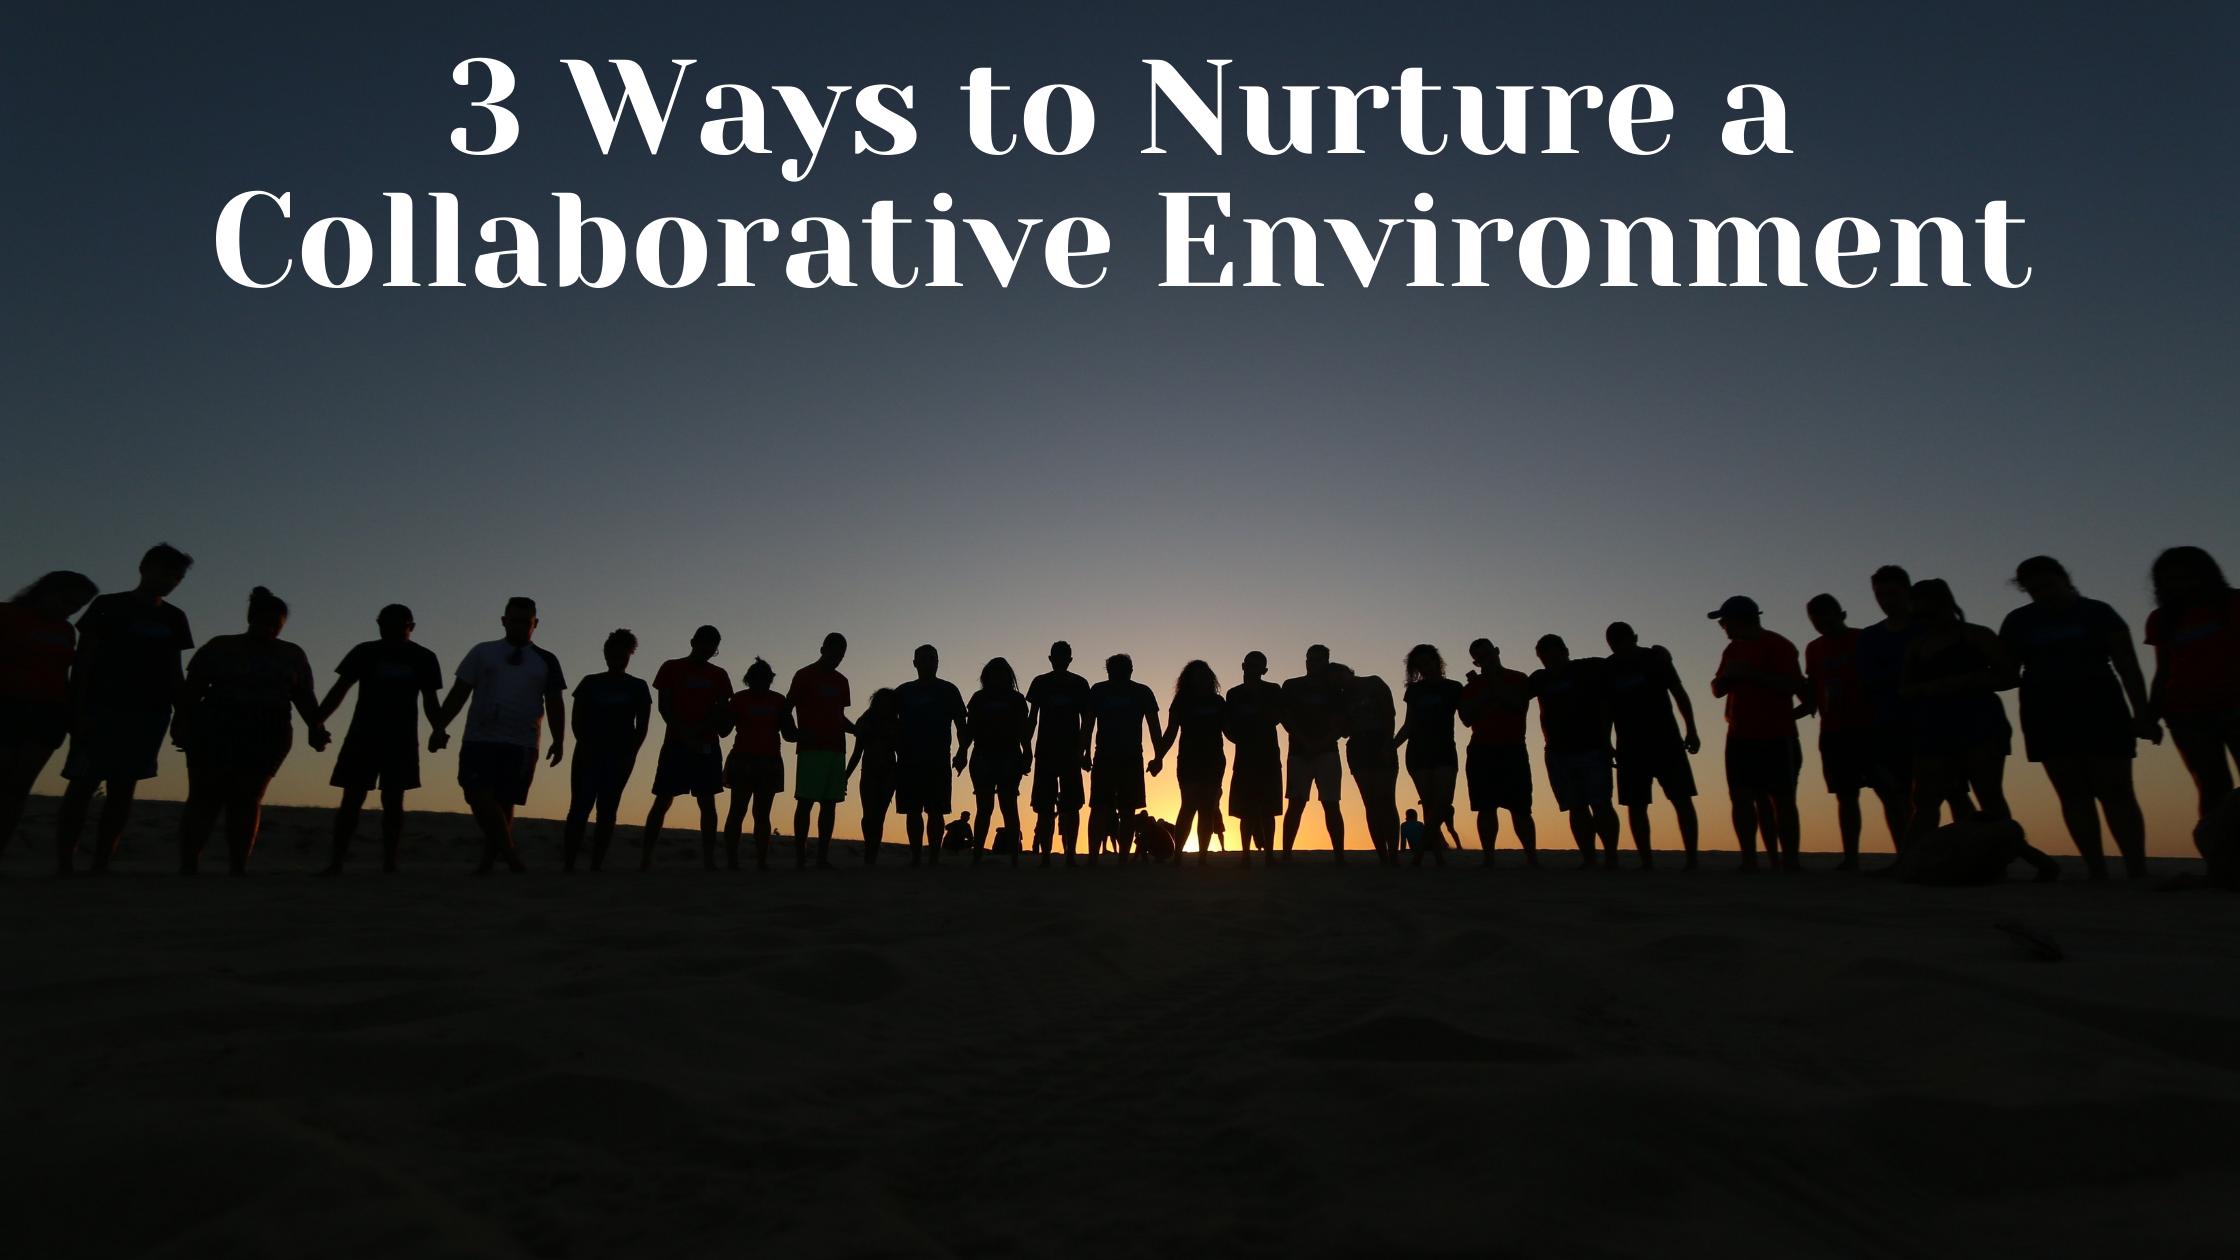 3 Ways to Nurture a Collaborative Environment